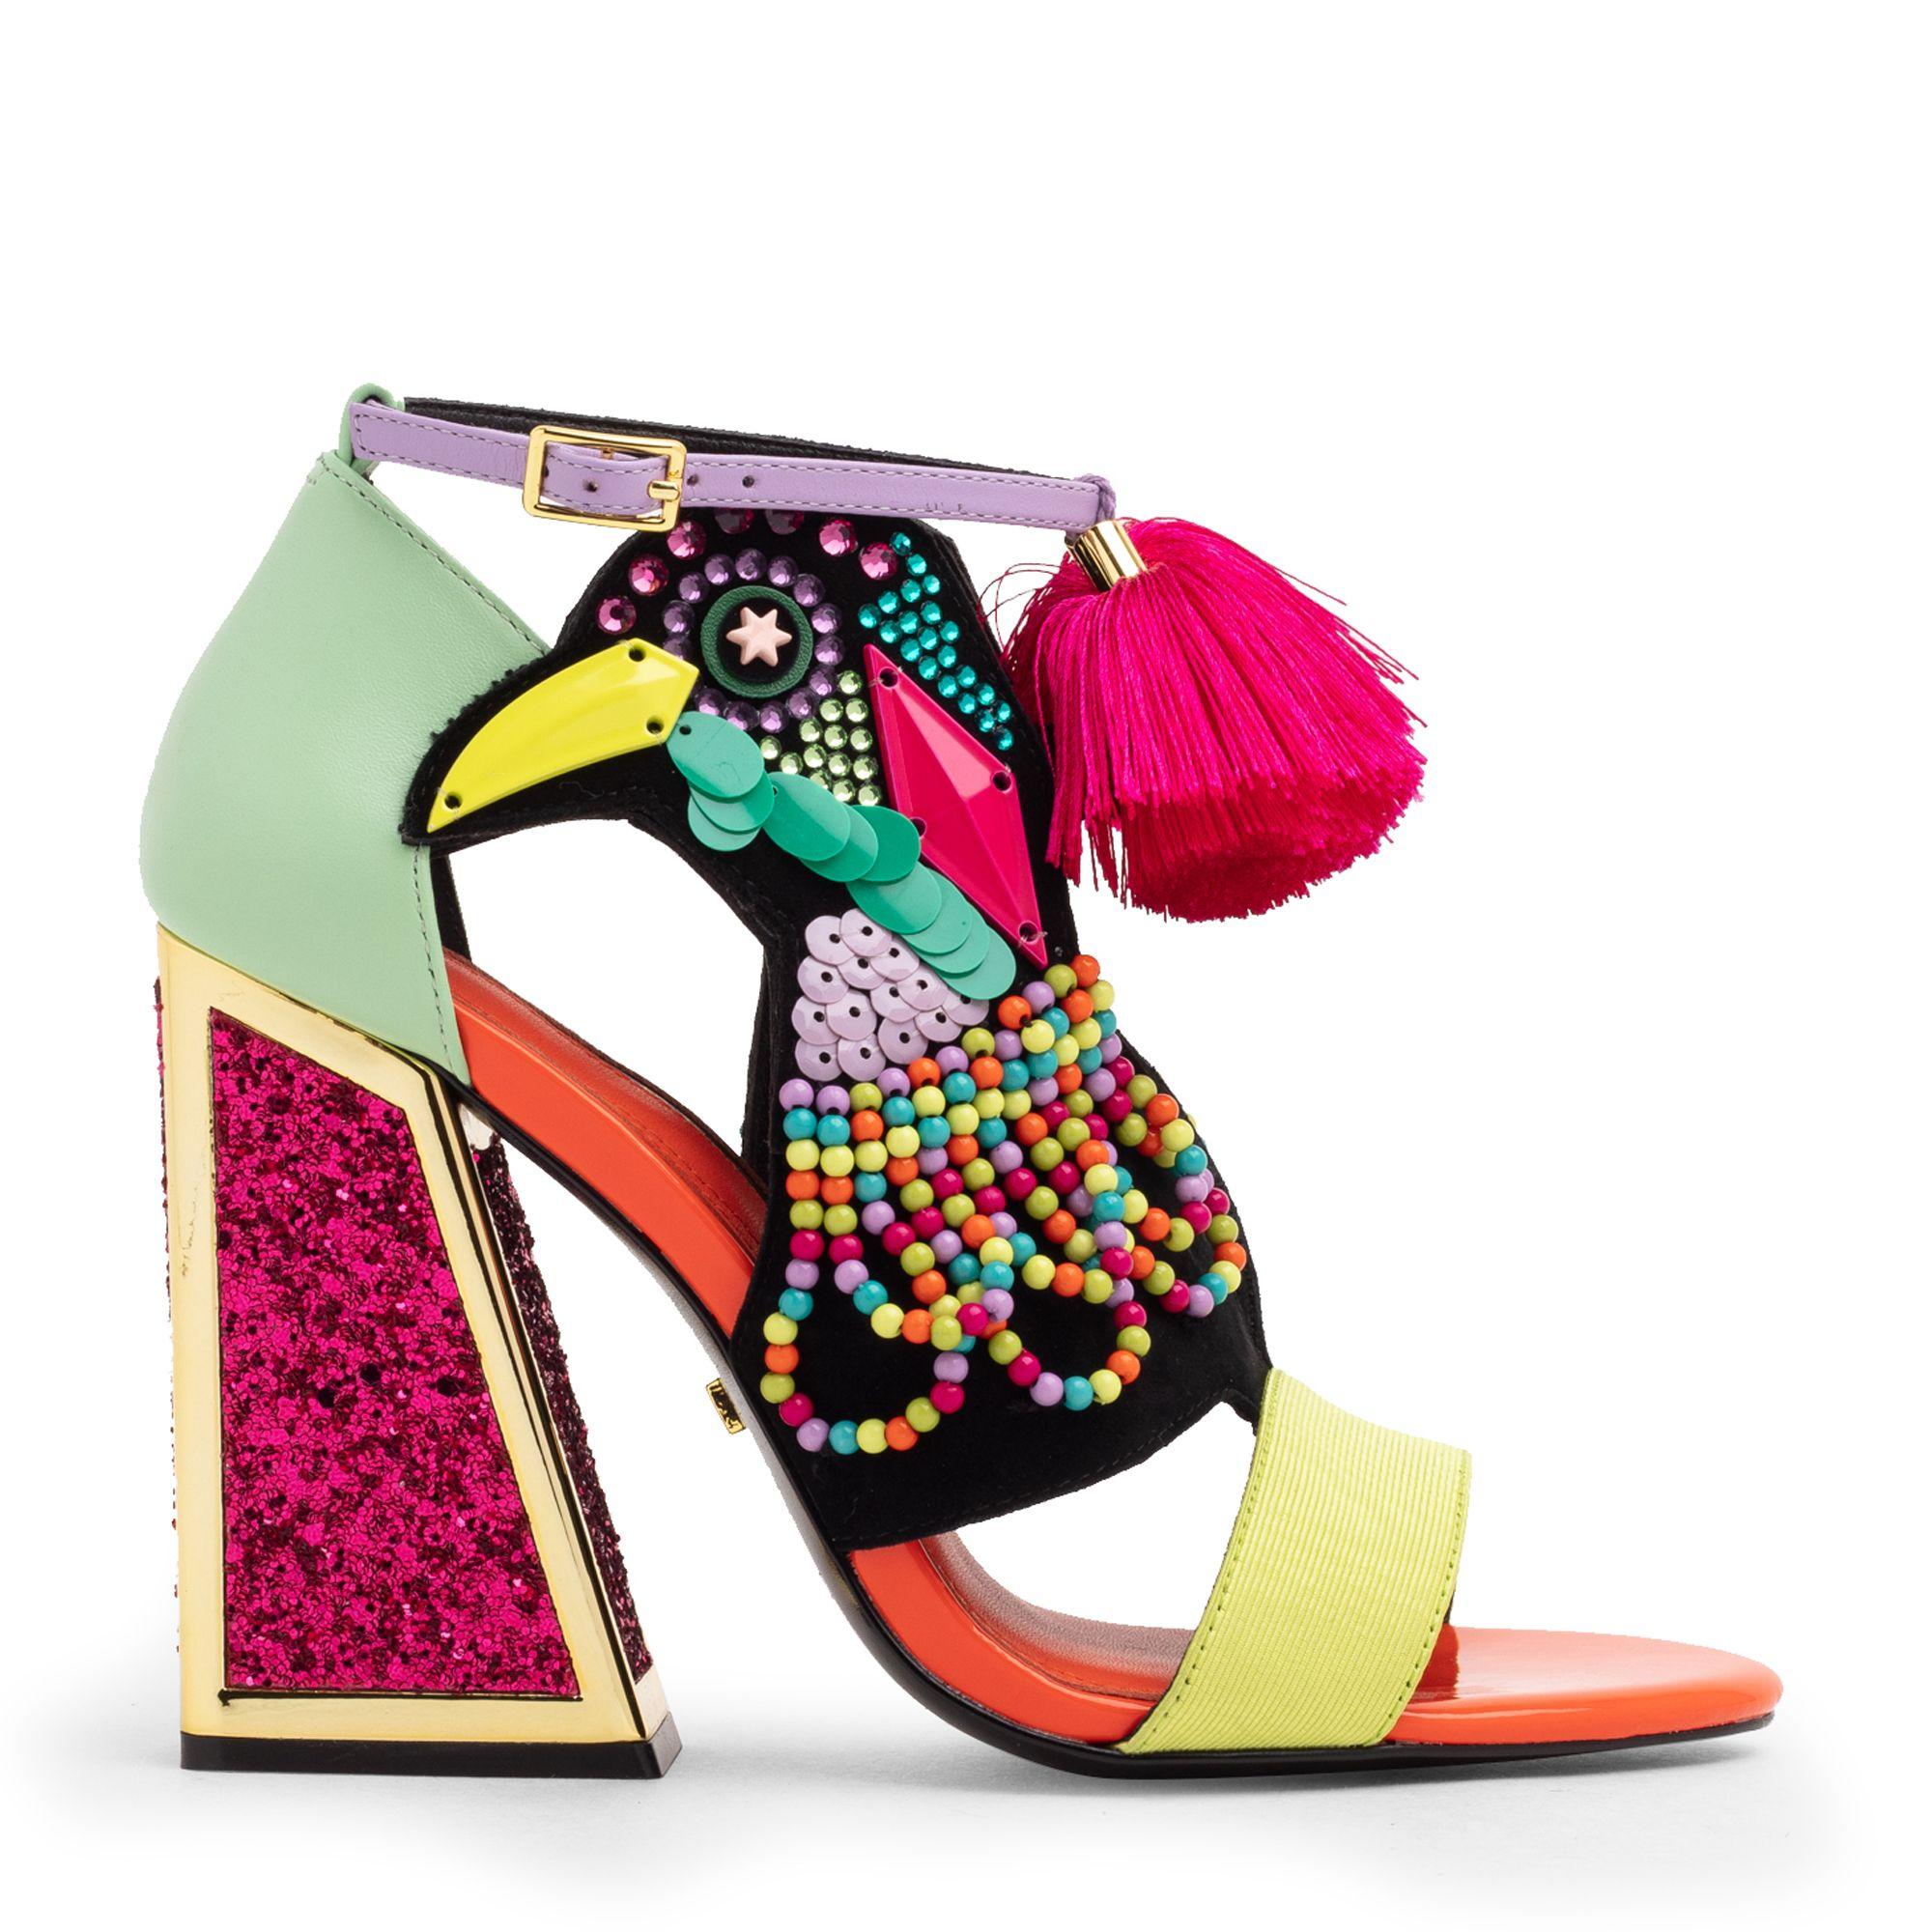 Aya sandals